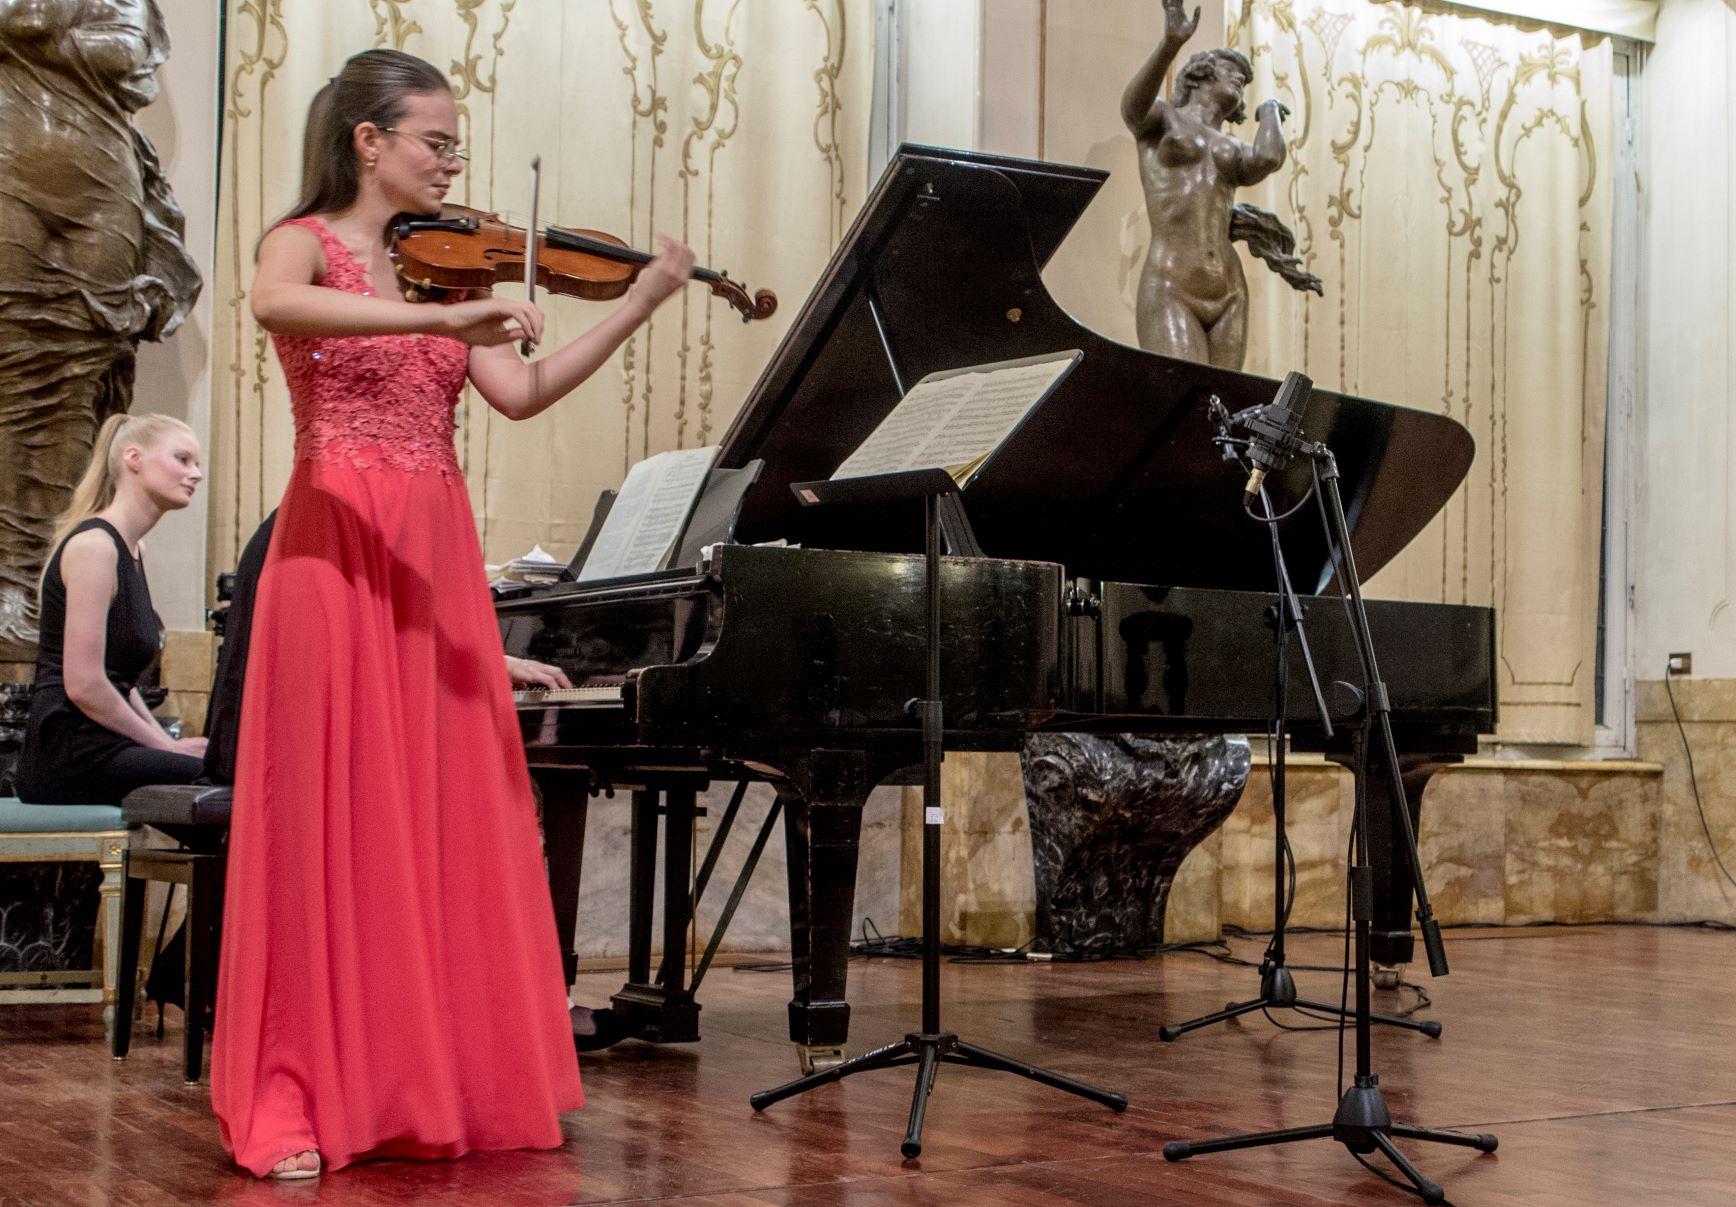 Borsista violino Chigiana 1